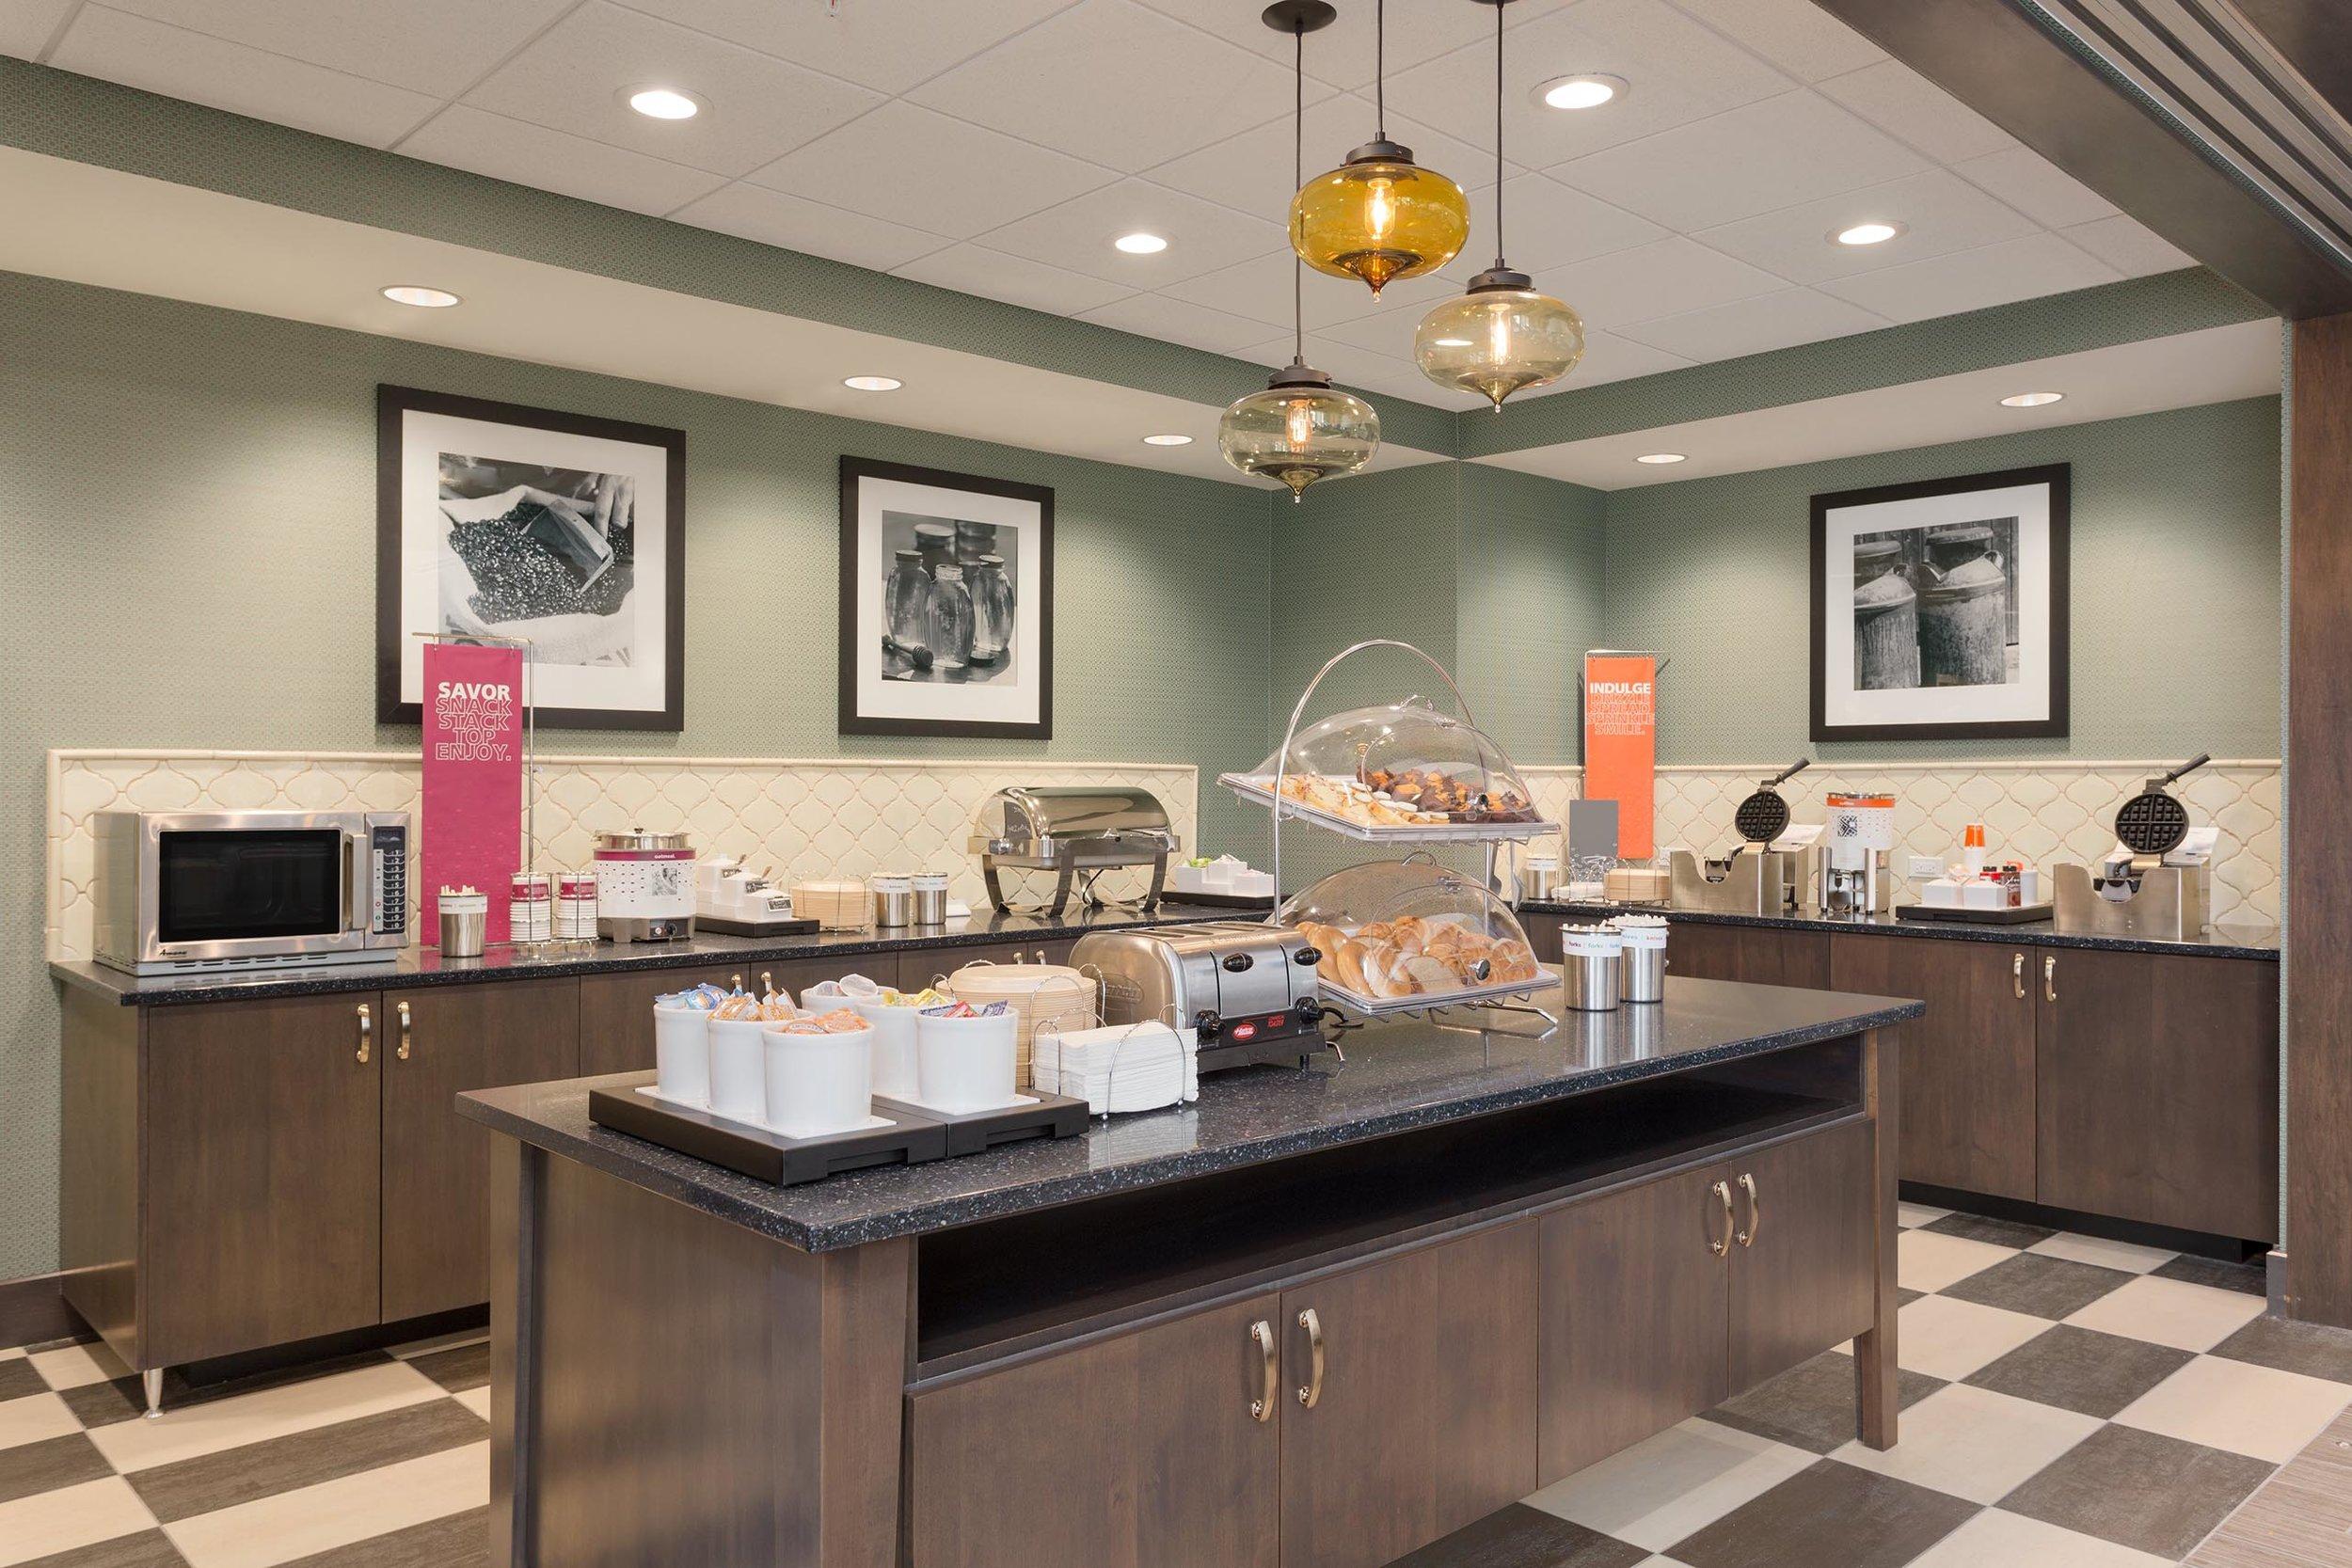 Breakfast area in the Hampton Inn & Suites in West Des Moines, IA